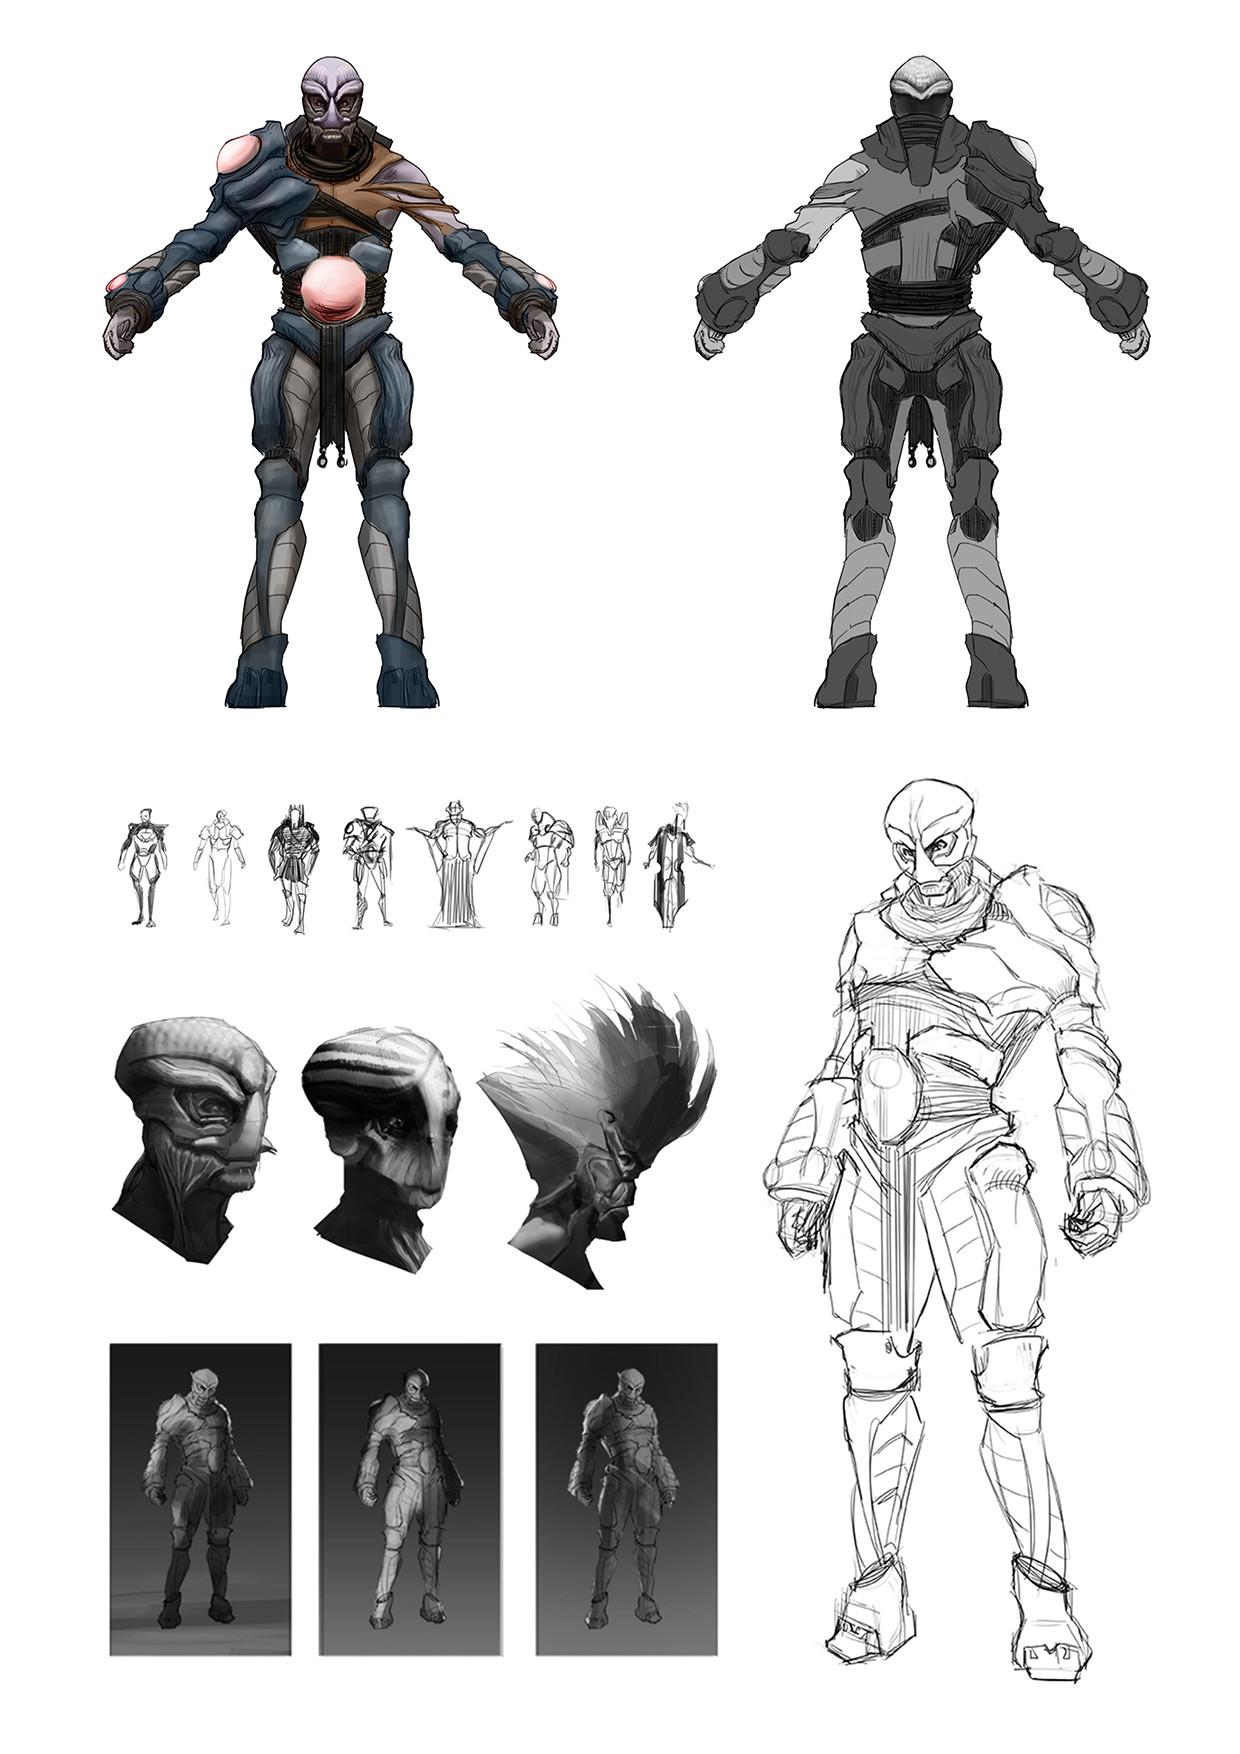 Chris leenheer alientribalwarrior01